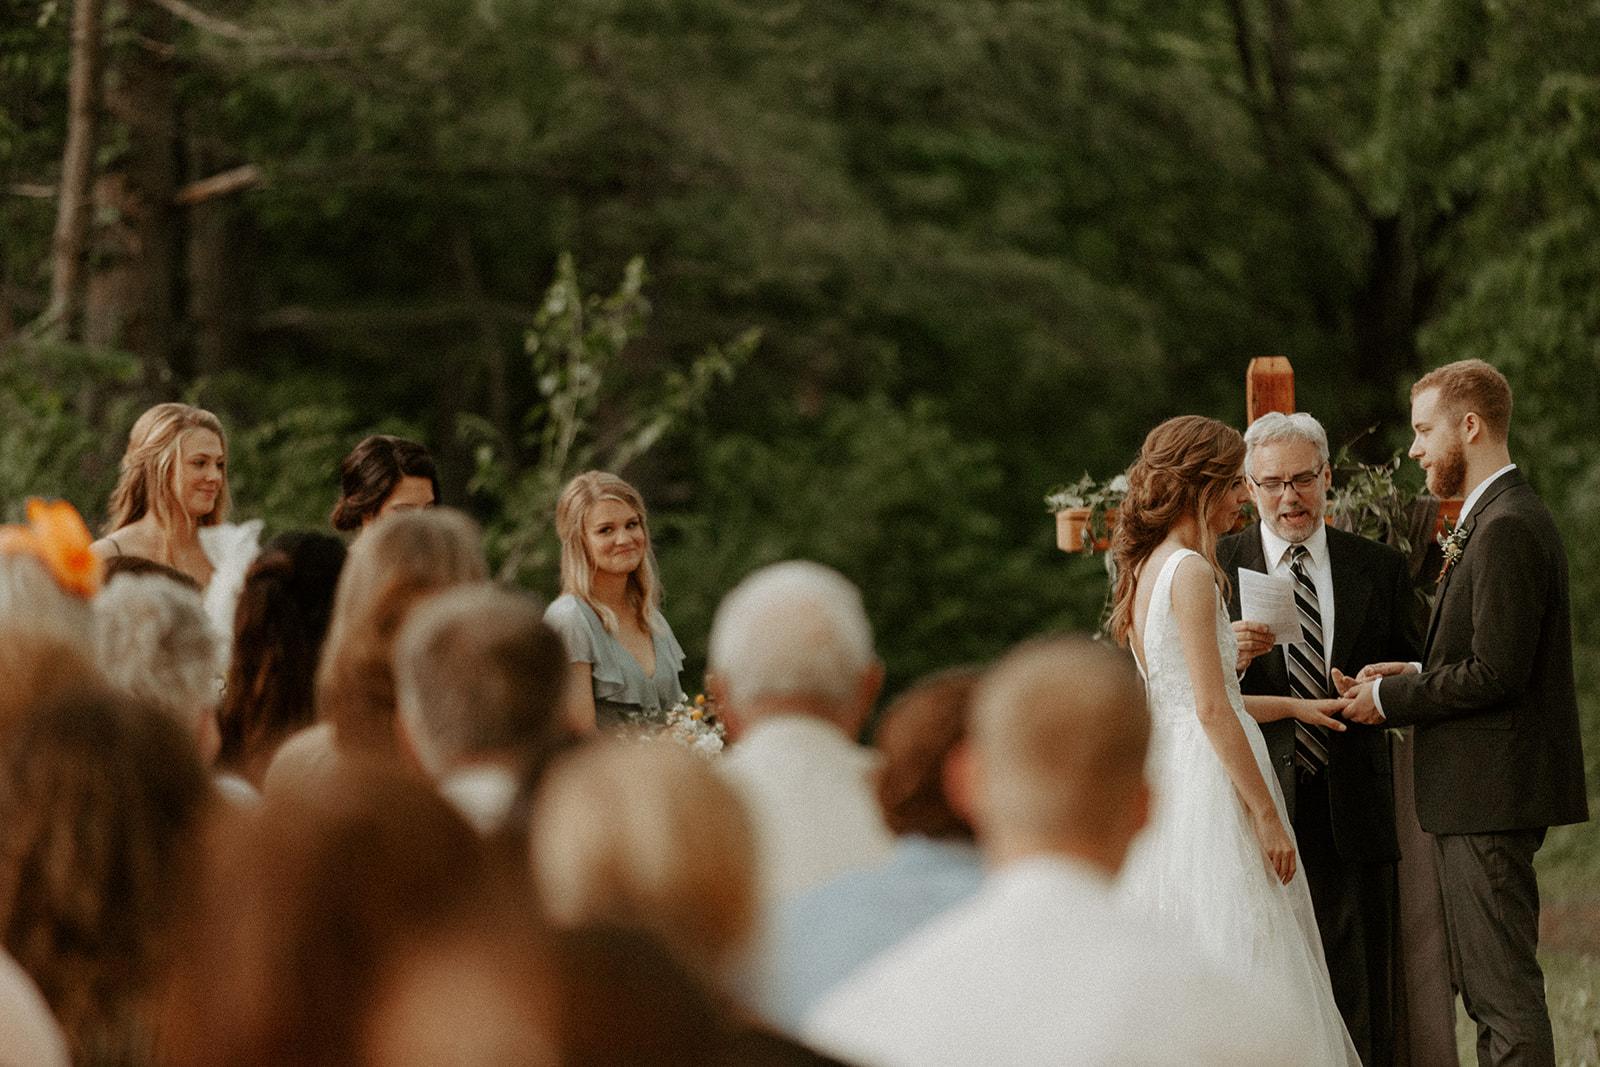 camp_wokanda_peoria_illinois_wedding_photographer_wright_photographs_bliese_0269.jpg